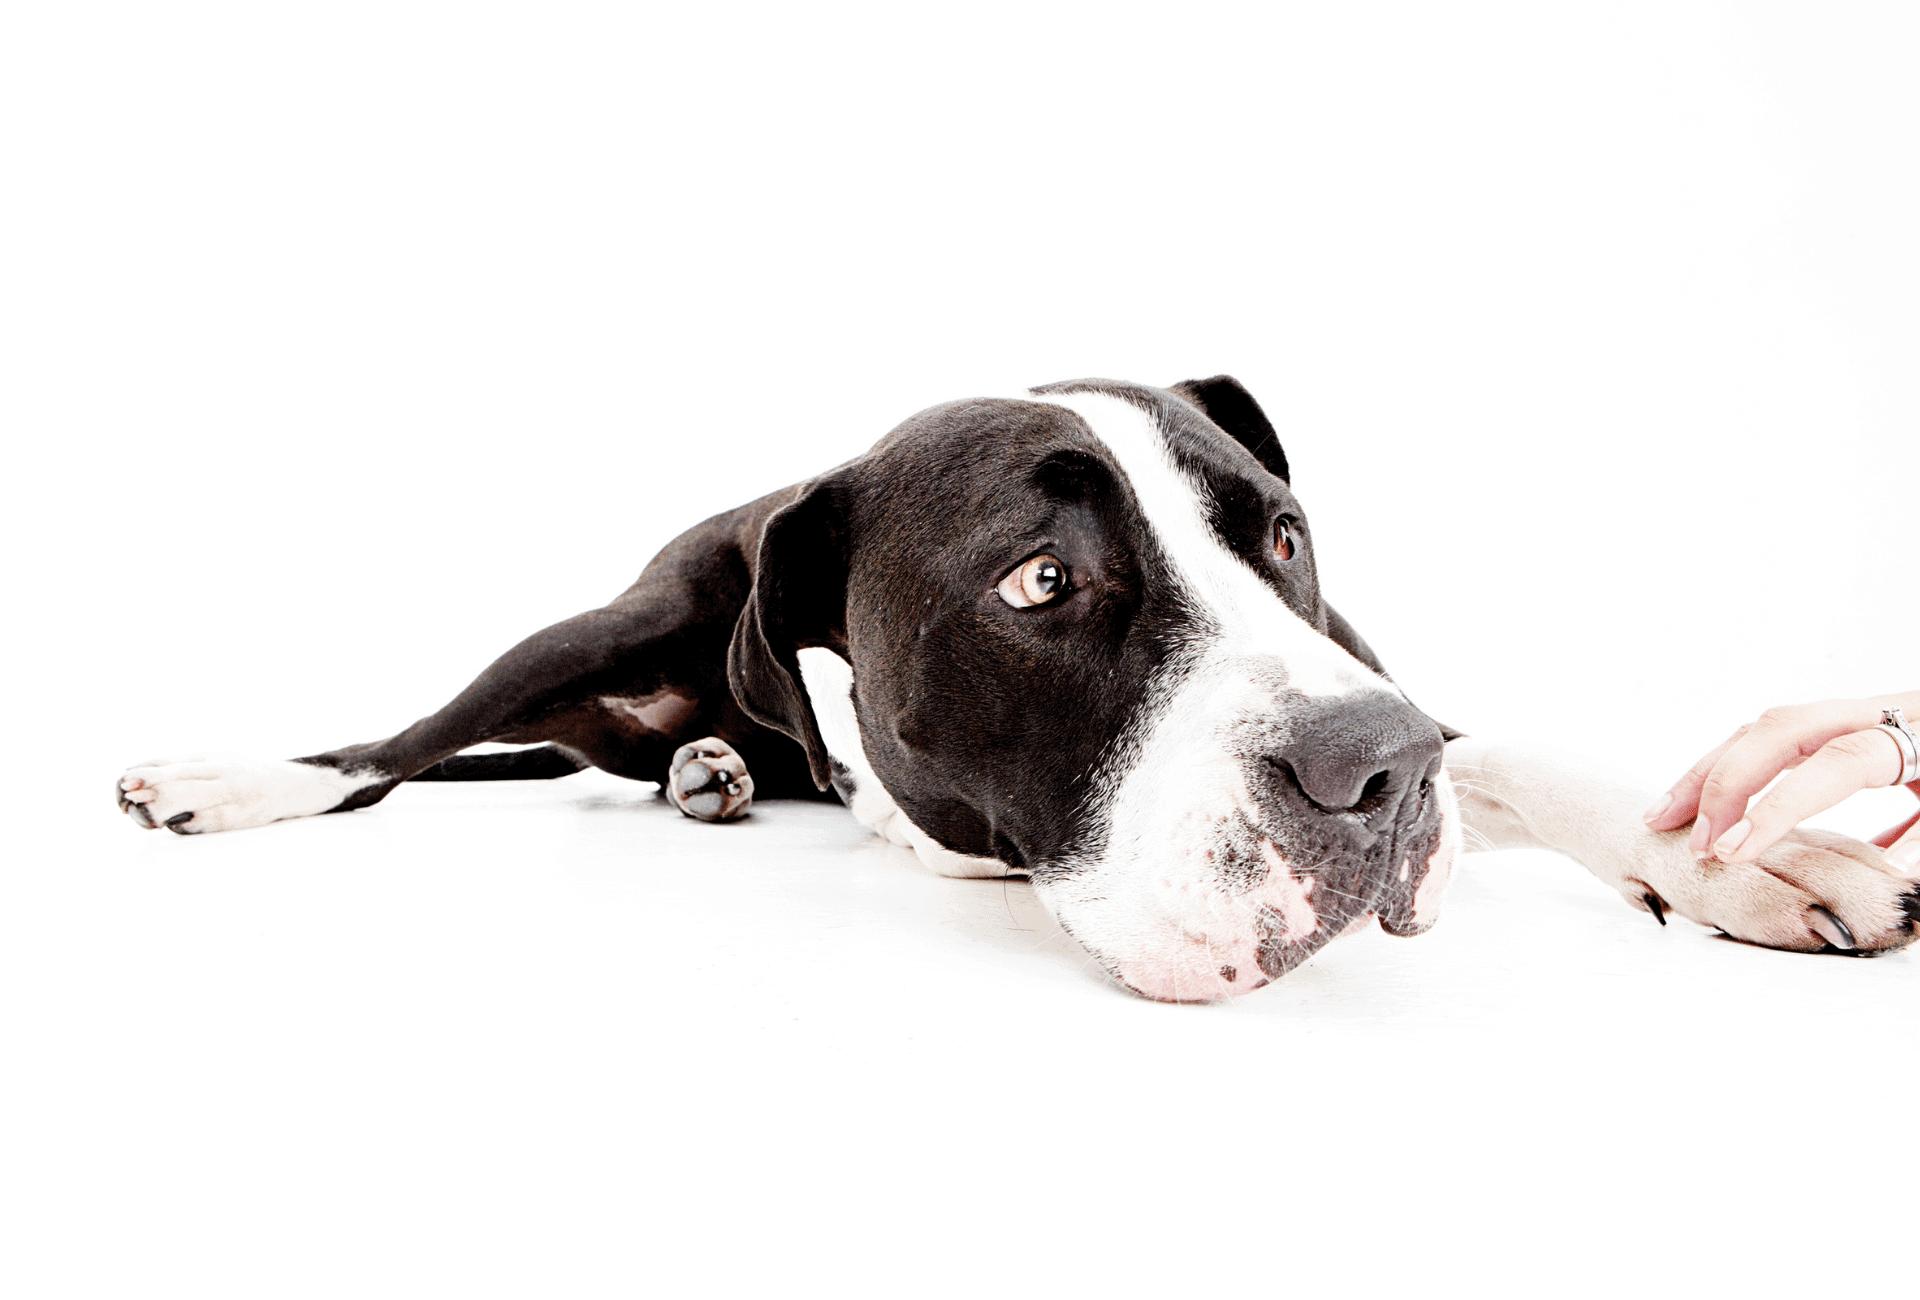 A dog looks like he sense discomfort while a human holds the dog's paw.